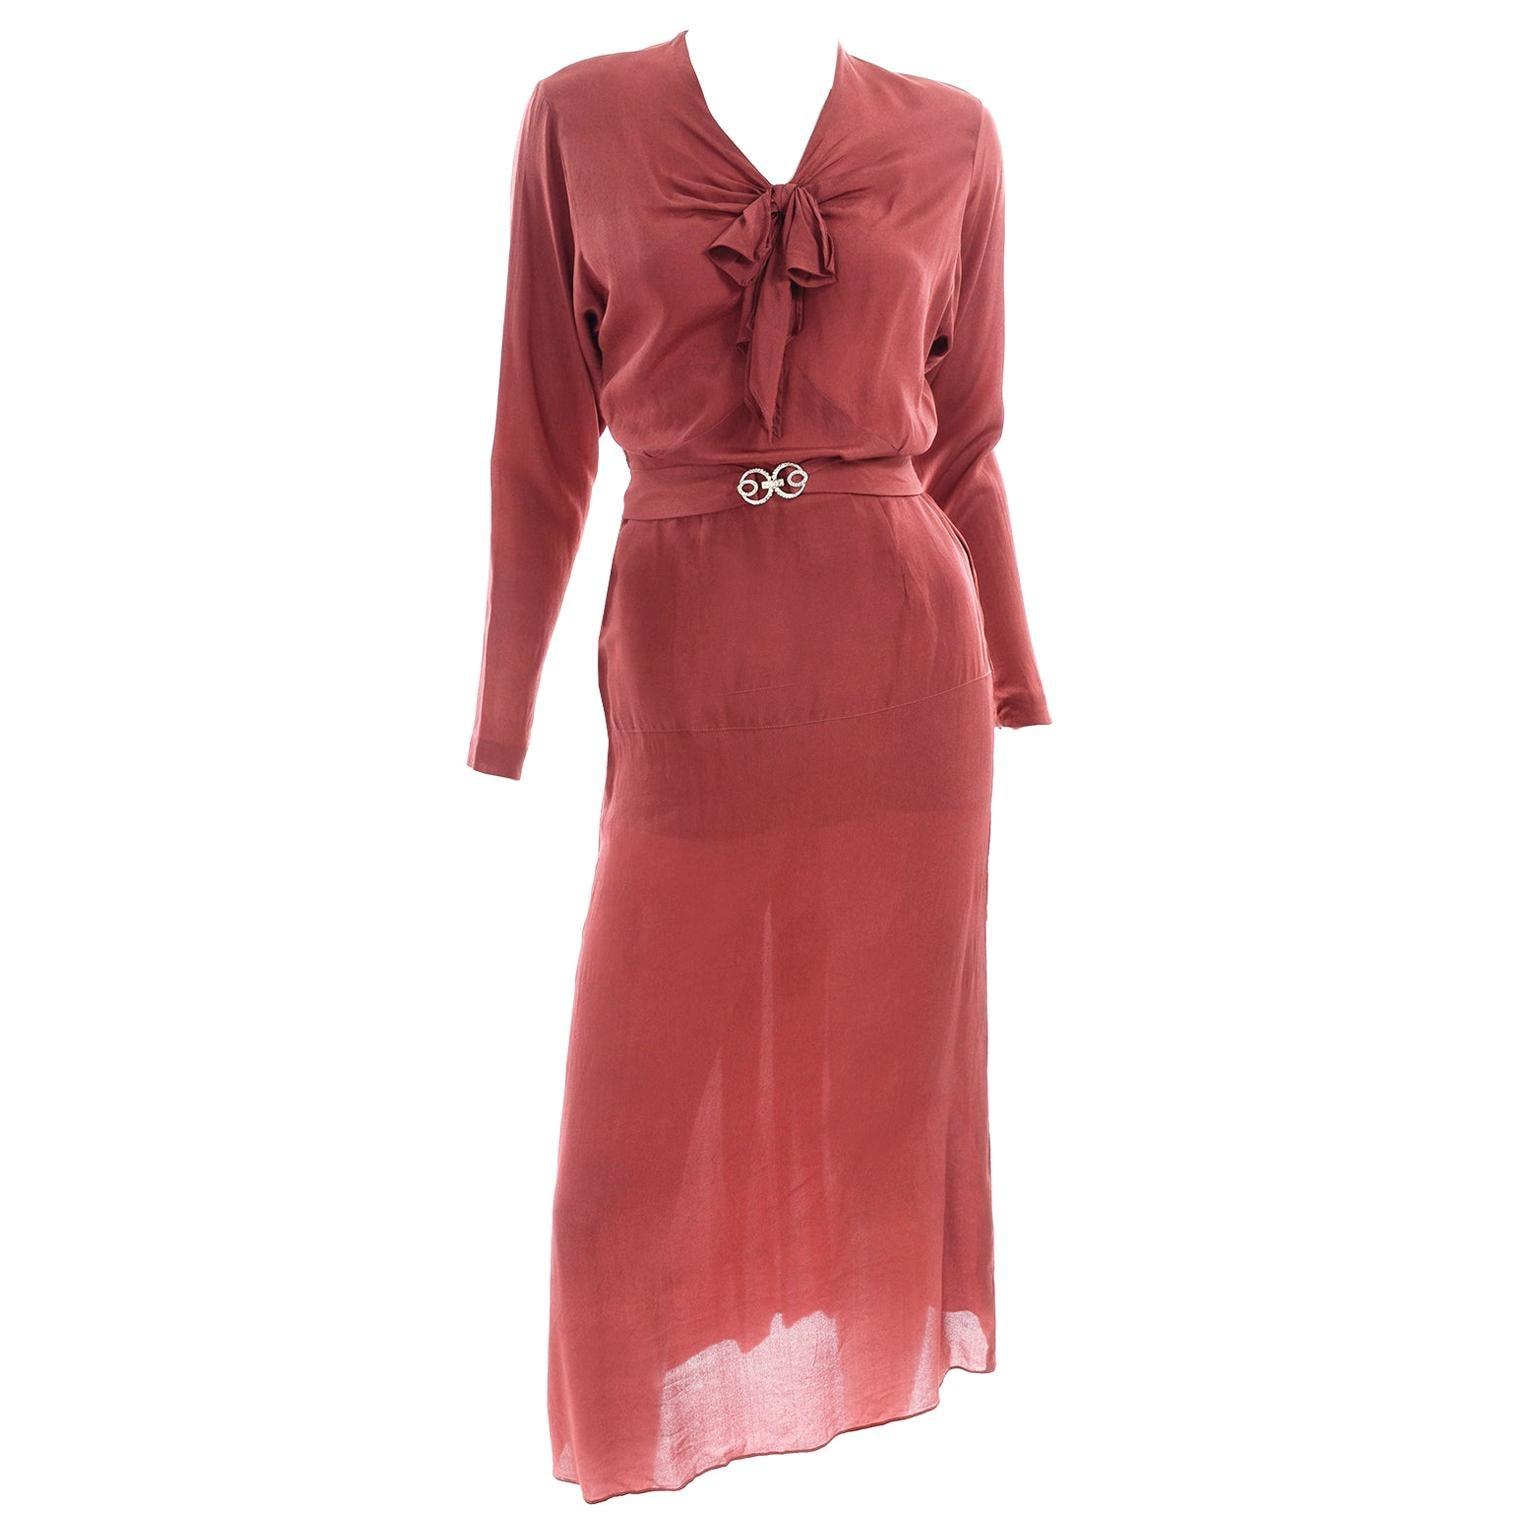 1930s Rusty Red Silk Vintage 2 Pc Bias Dress With Rhinestone Belt and Tie